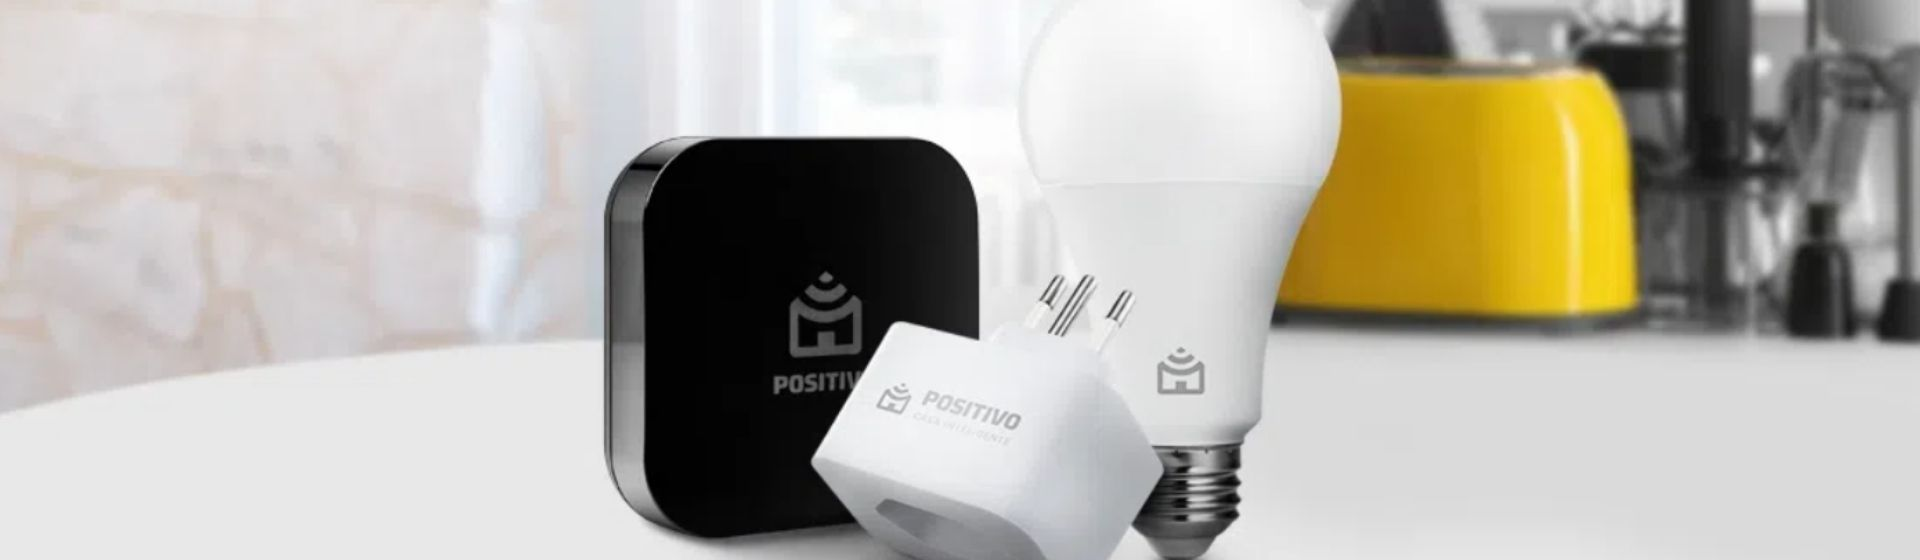 Kit casa conectada lâmpada Positivo: vale a pena? Veja a análise de ficha técnica